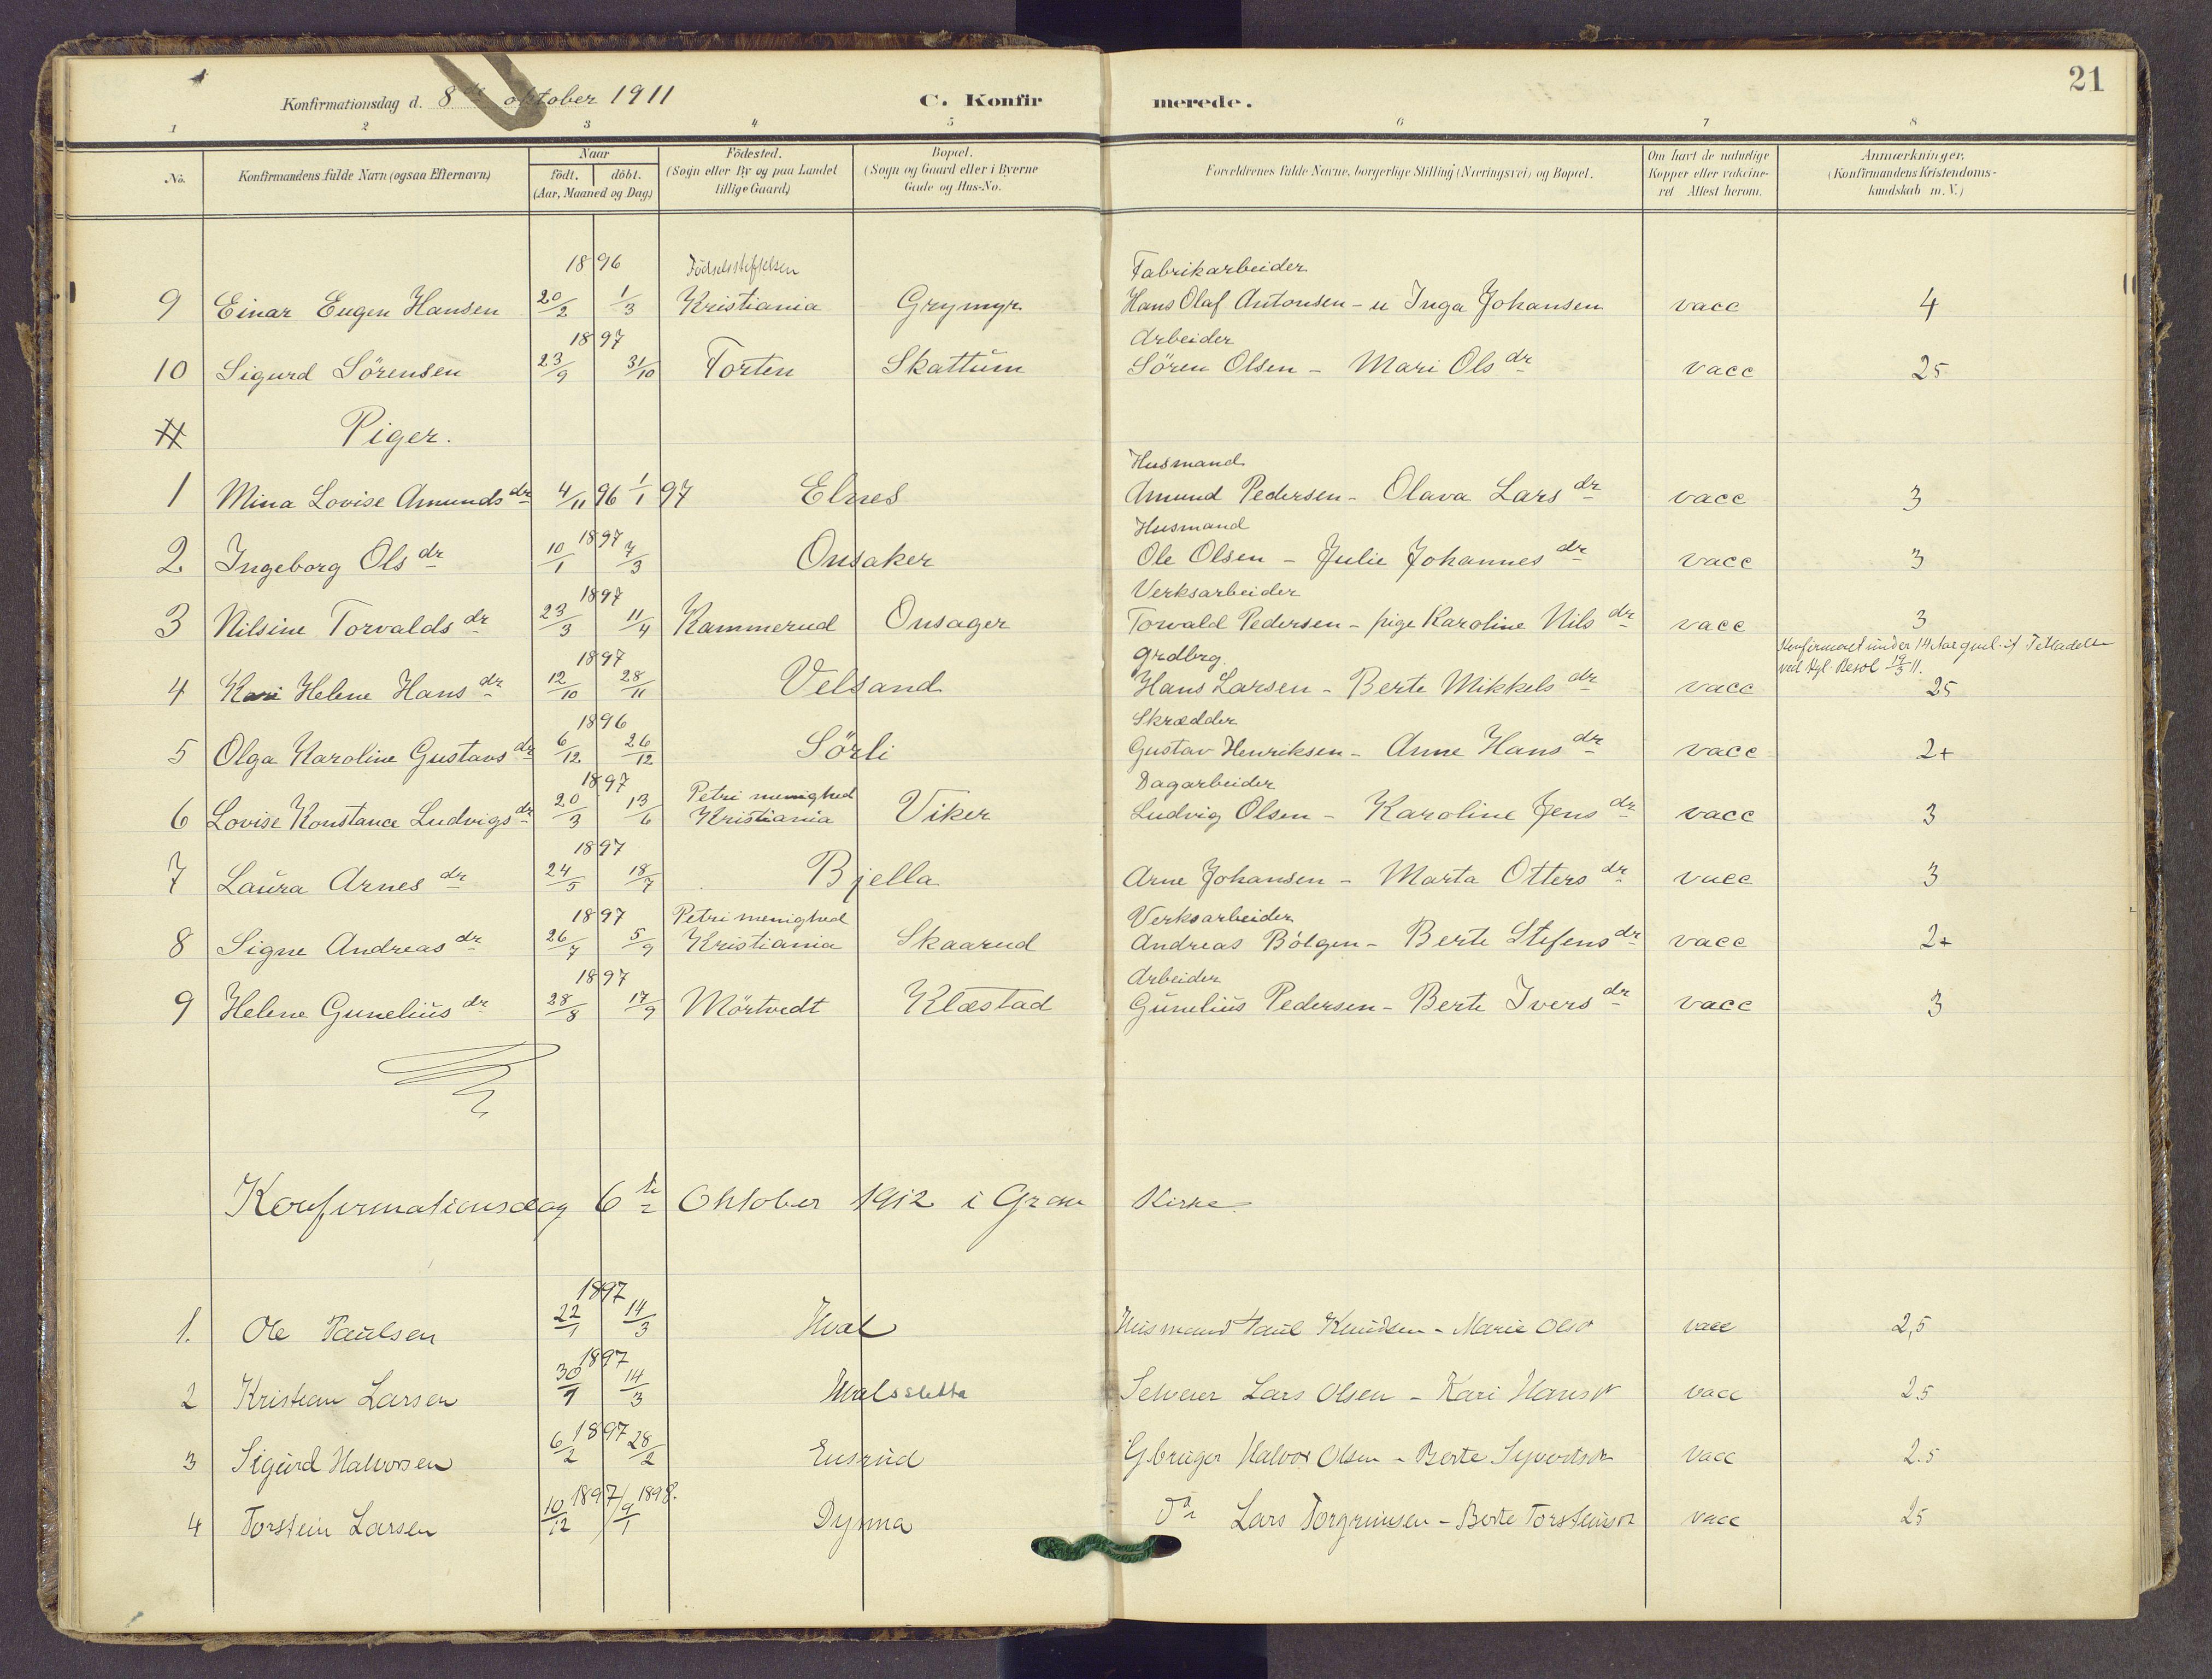 SAH, Gran prestekontor, Parish register (official) no. 22, 1908-1918, p. 21